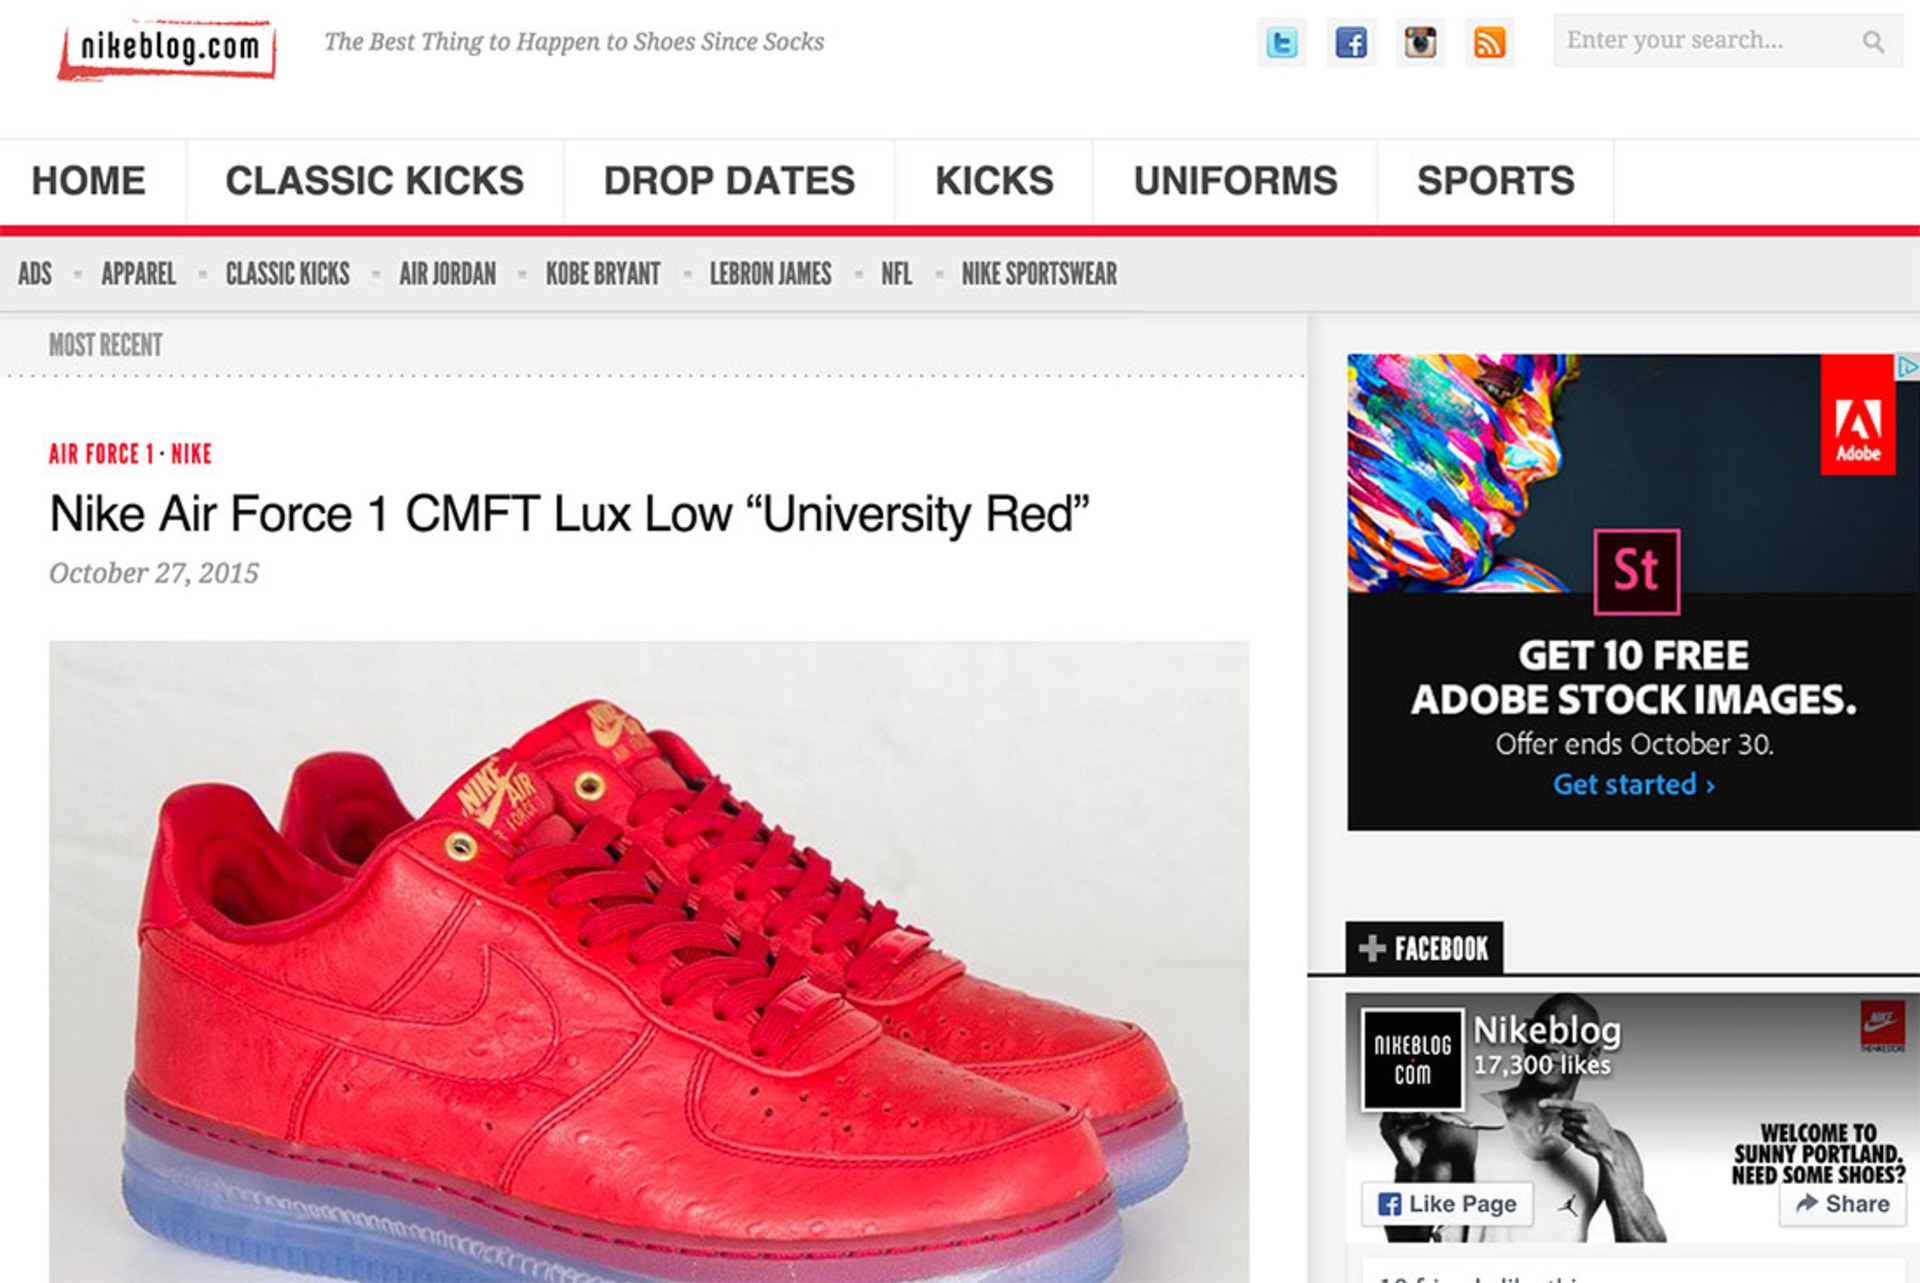 95018a7c3b14 25 Best Sneaker Blogs Right Now